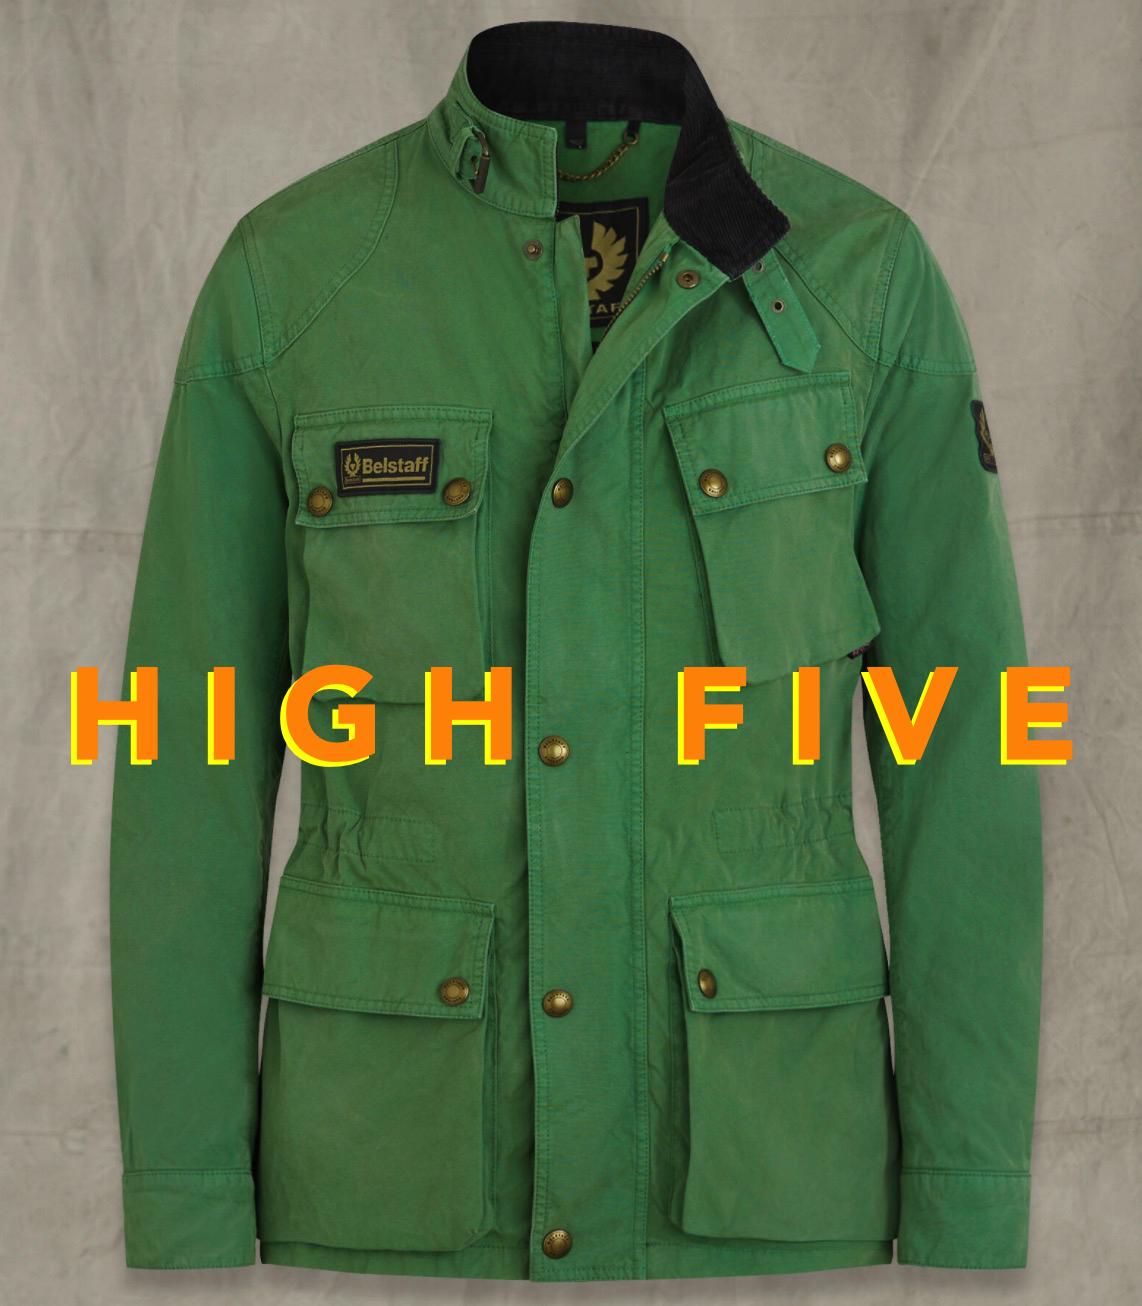 High Five – September 8th, 2020